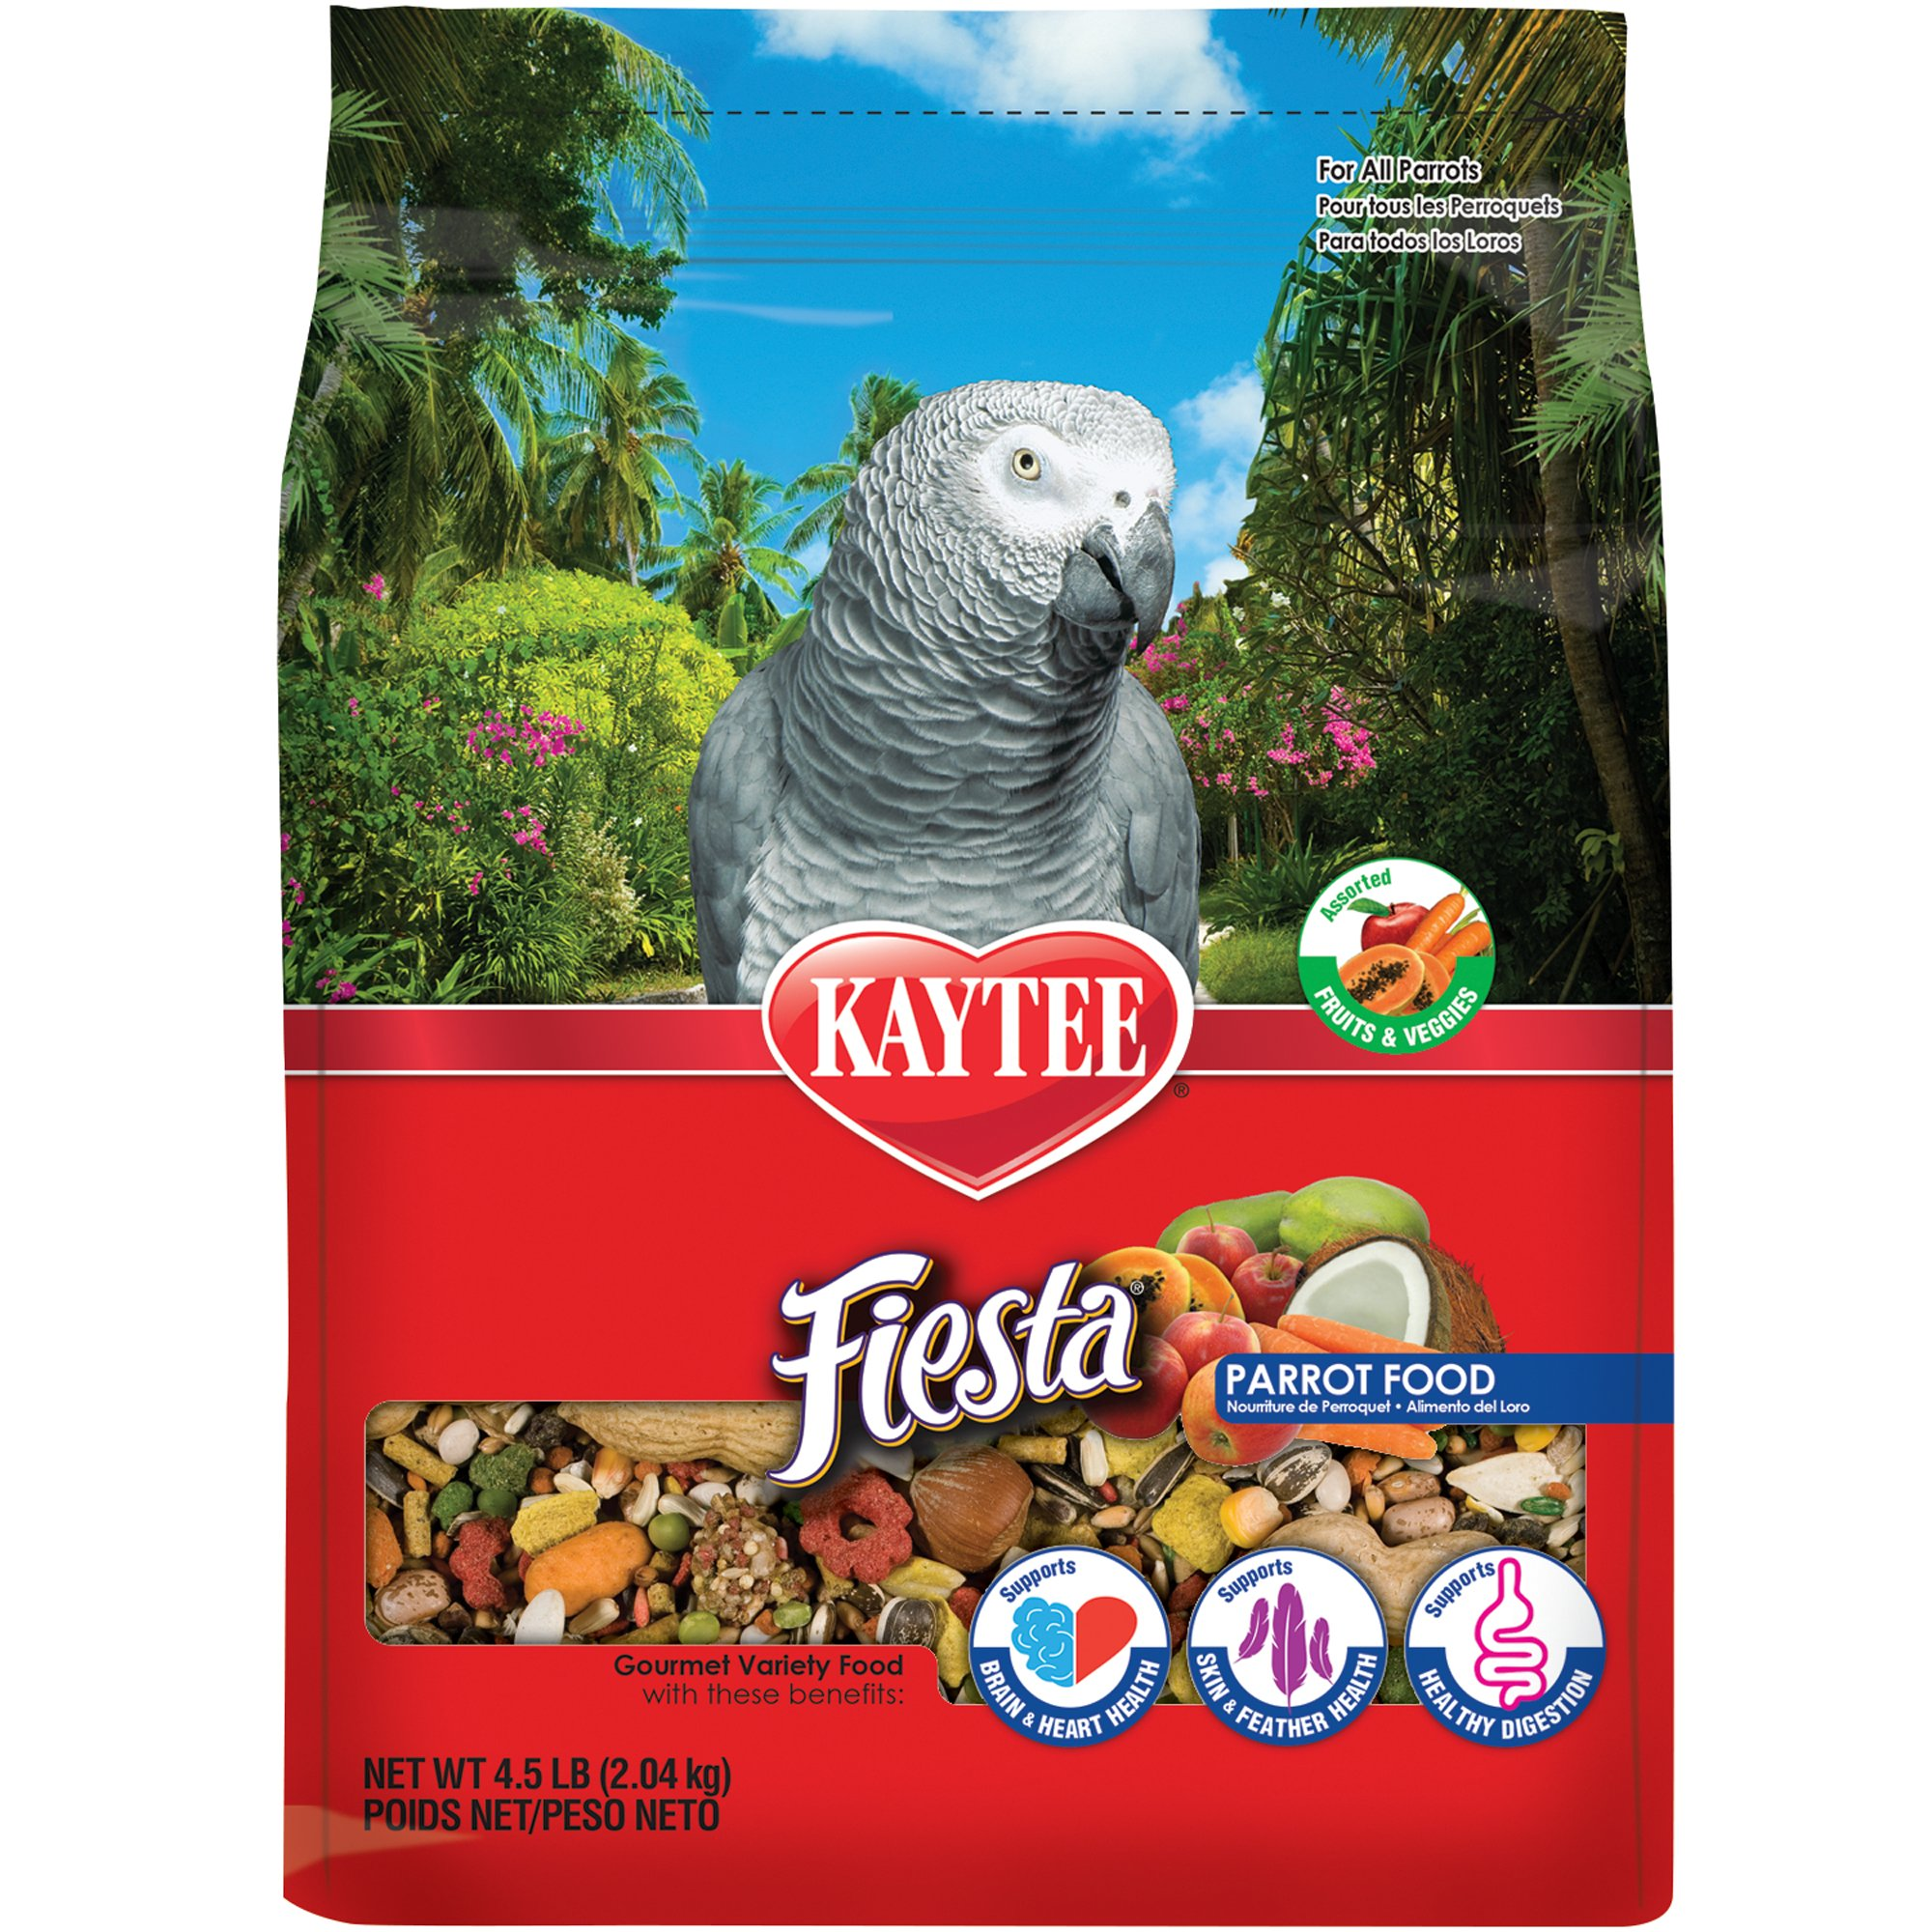 Kaytee Fiesta MAX Bird Food for Parrots